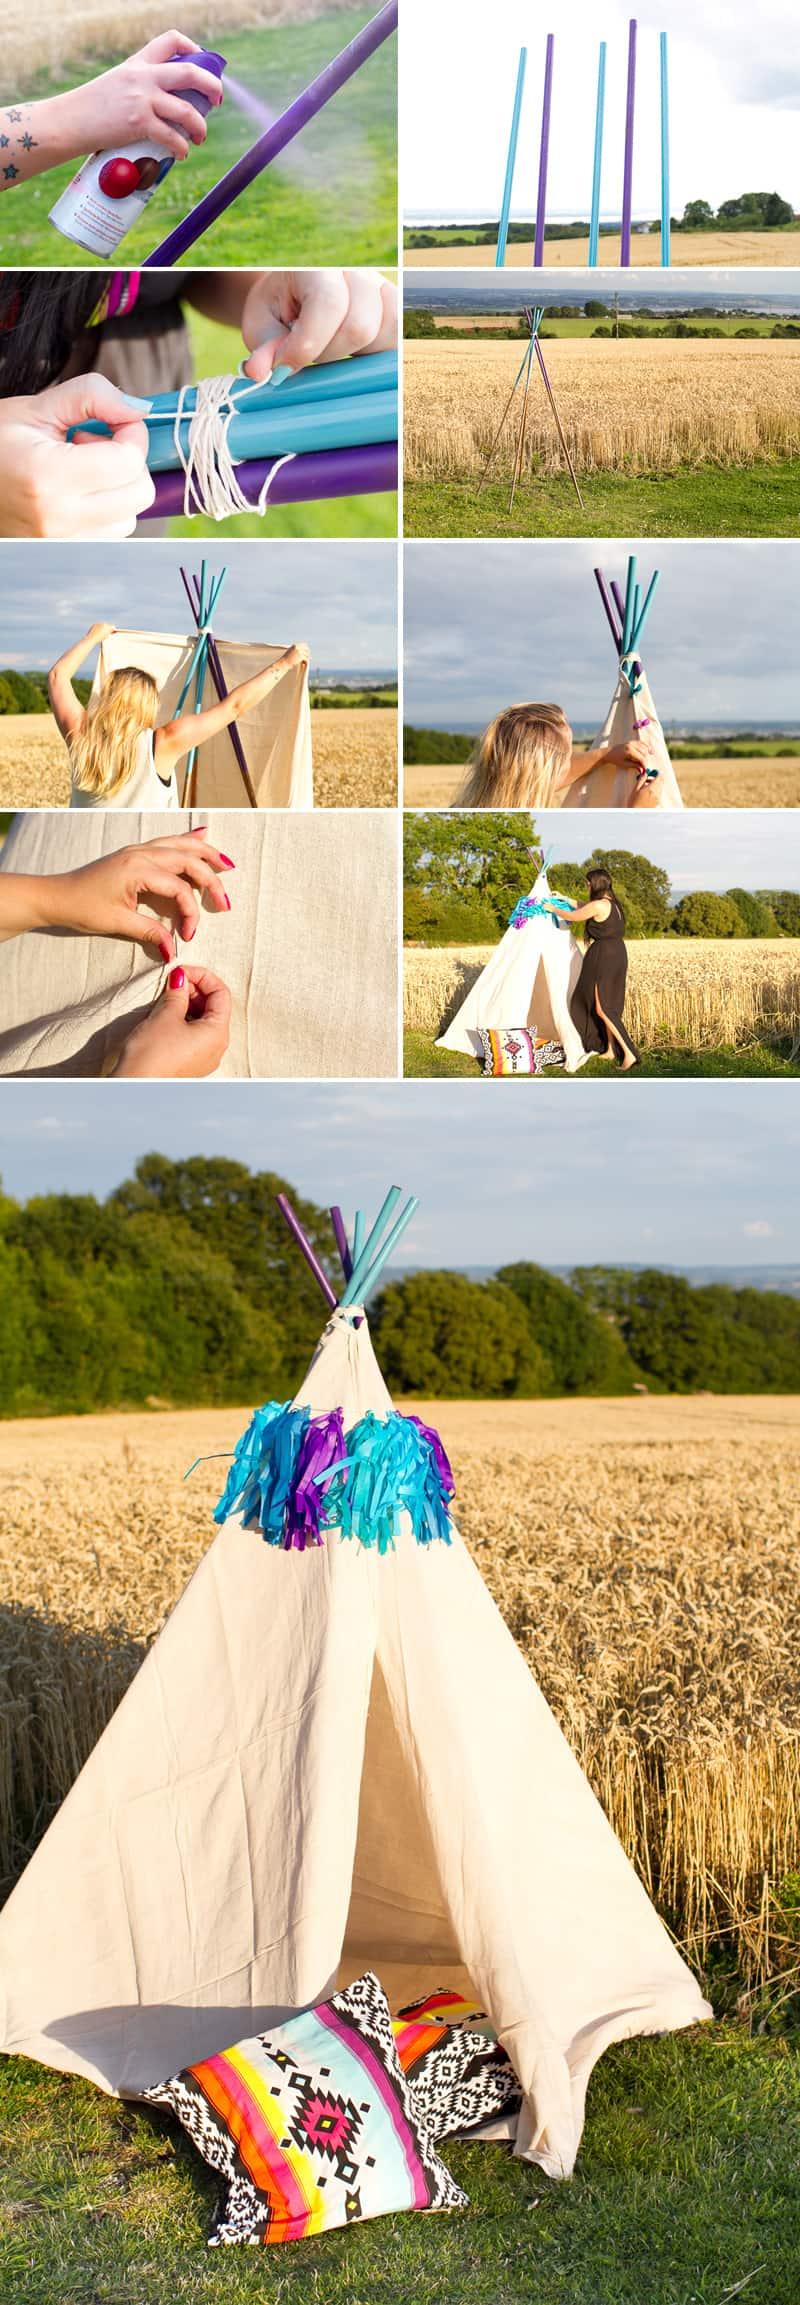 DIY Mini Tipi How to make teepee collage